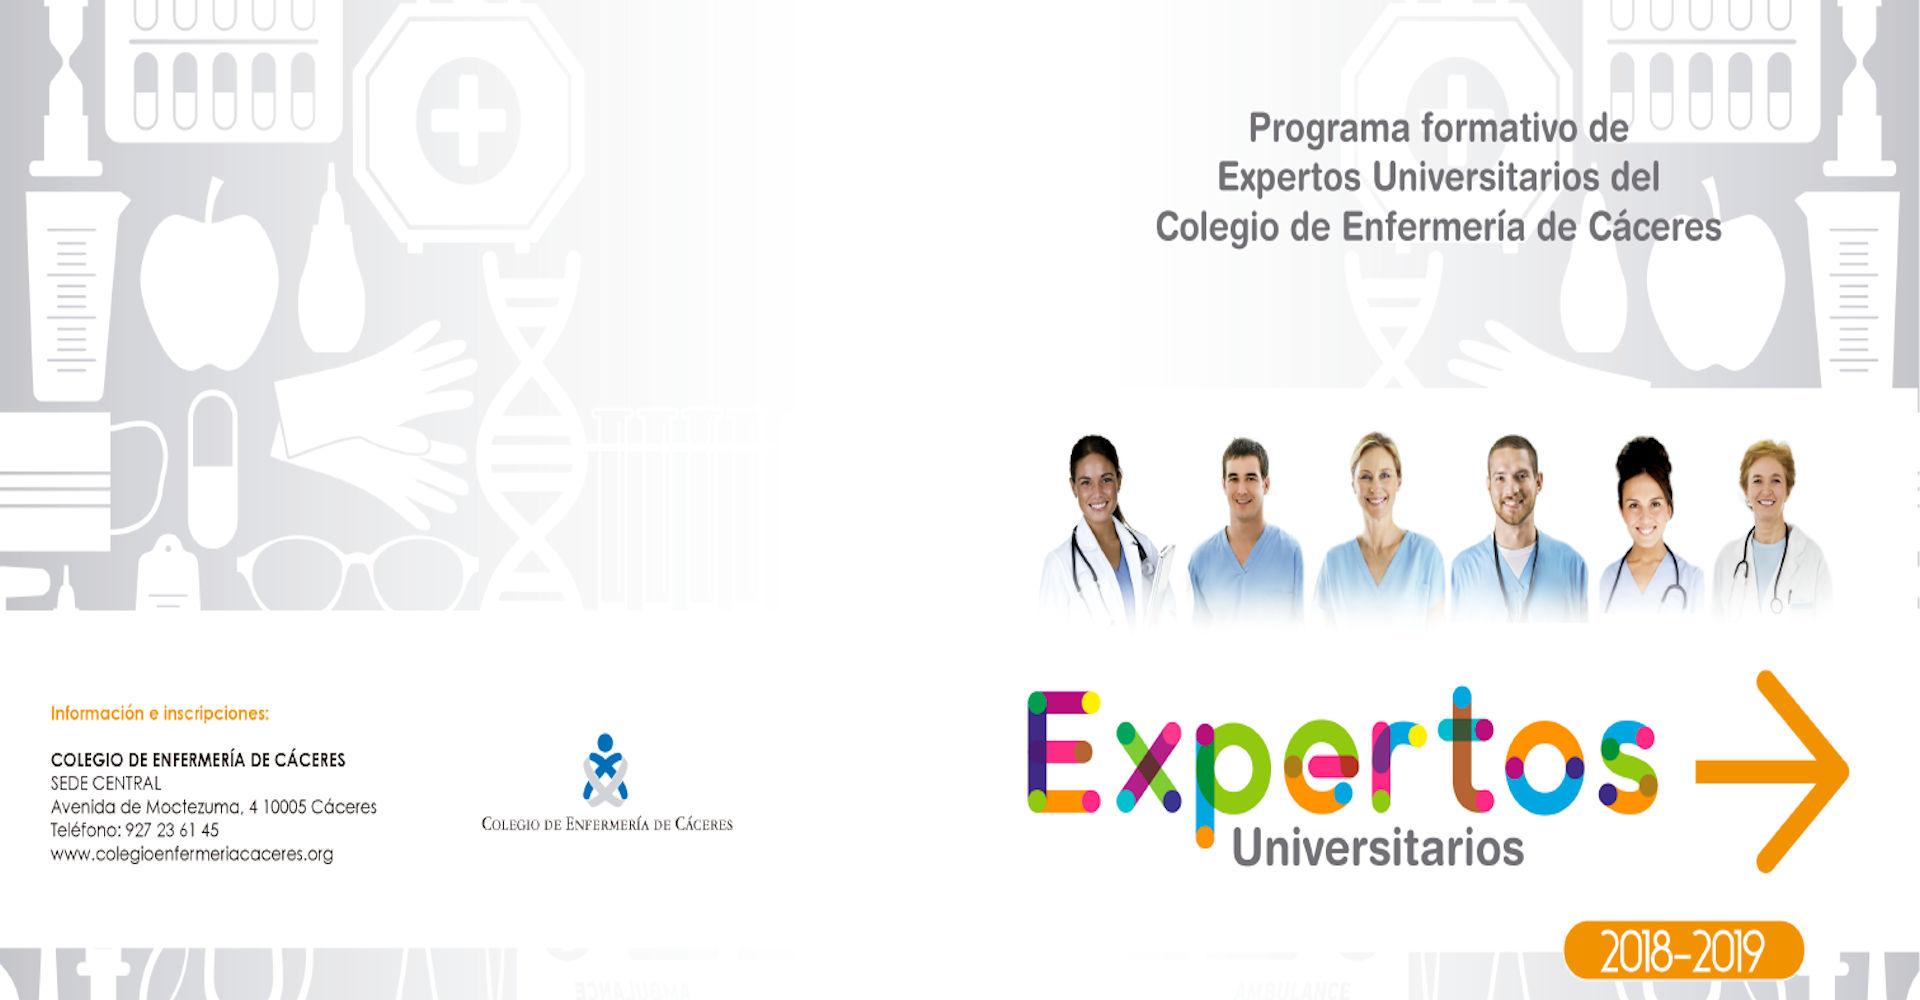 Expertos Universitarios 2018-19 (Cabecera)